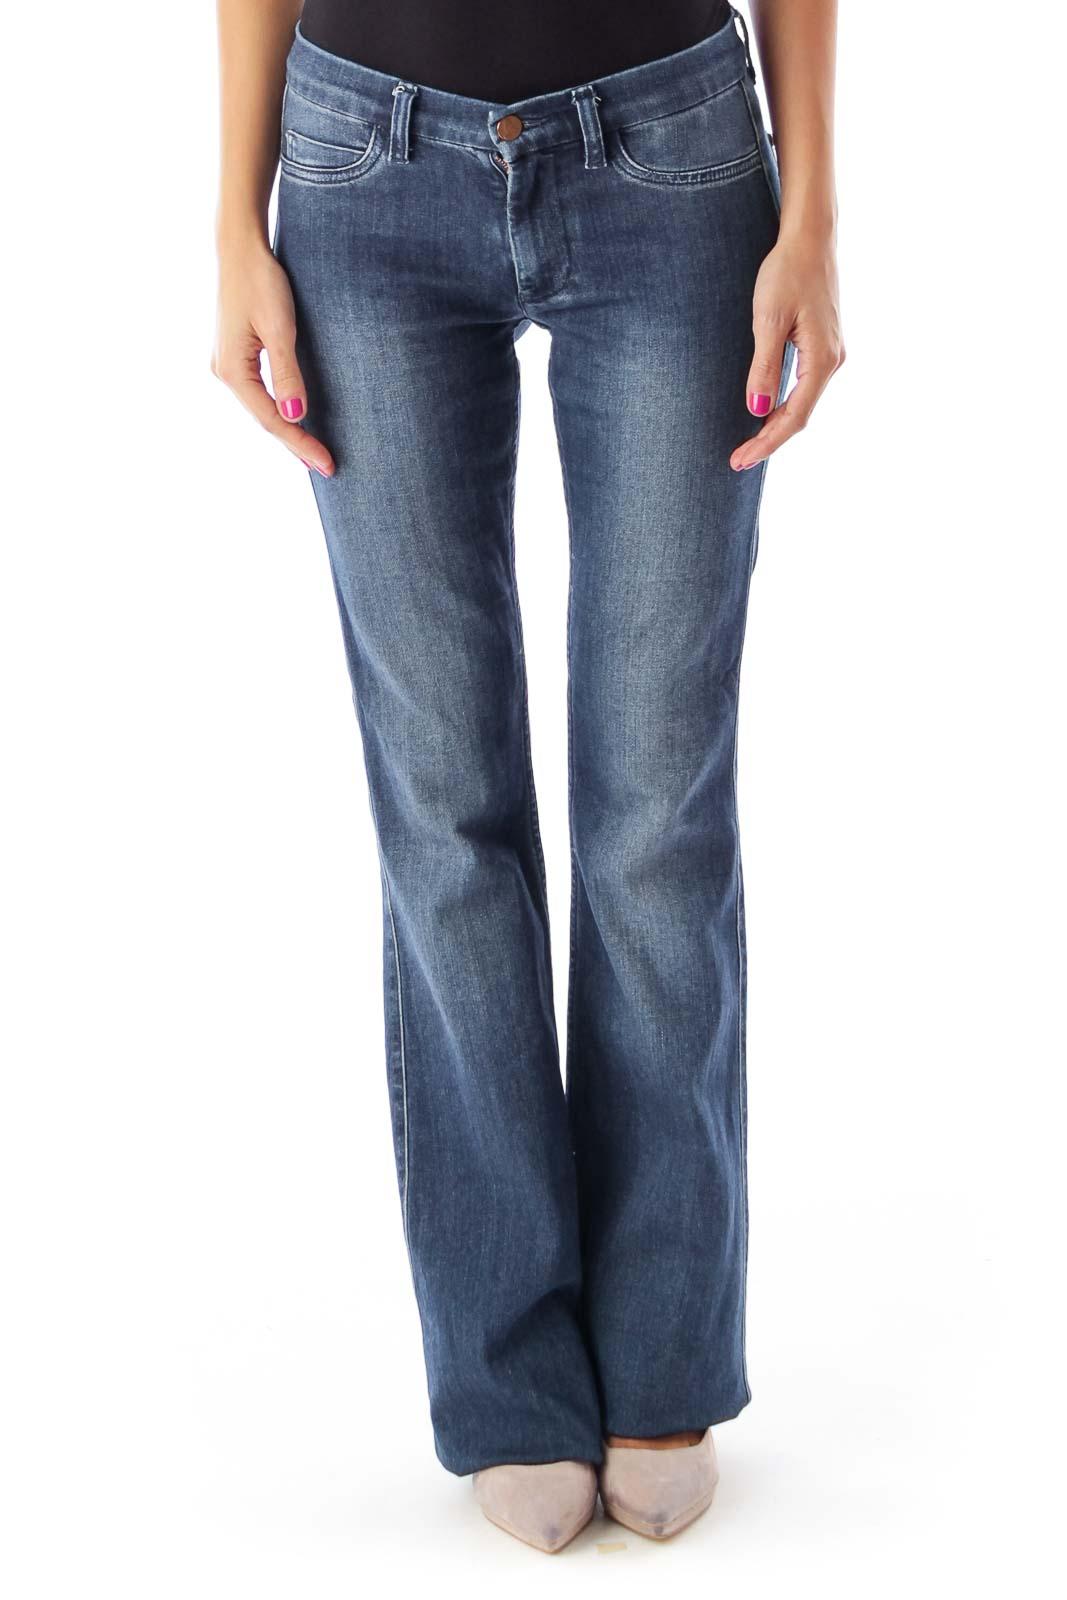 Dark Blue Bodycon Flare Jeans Front